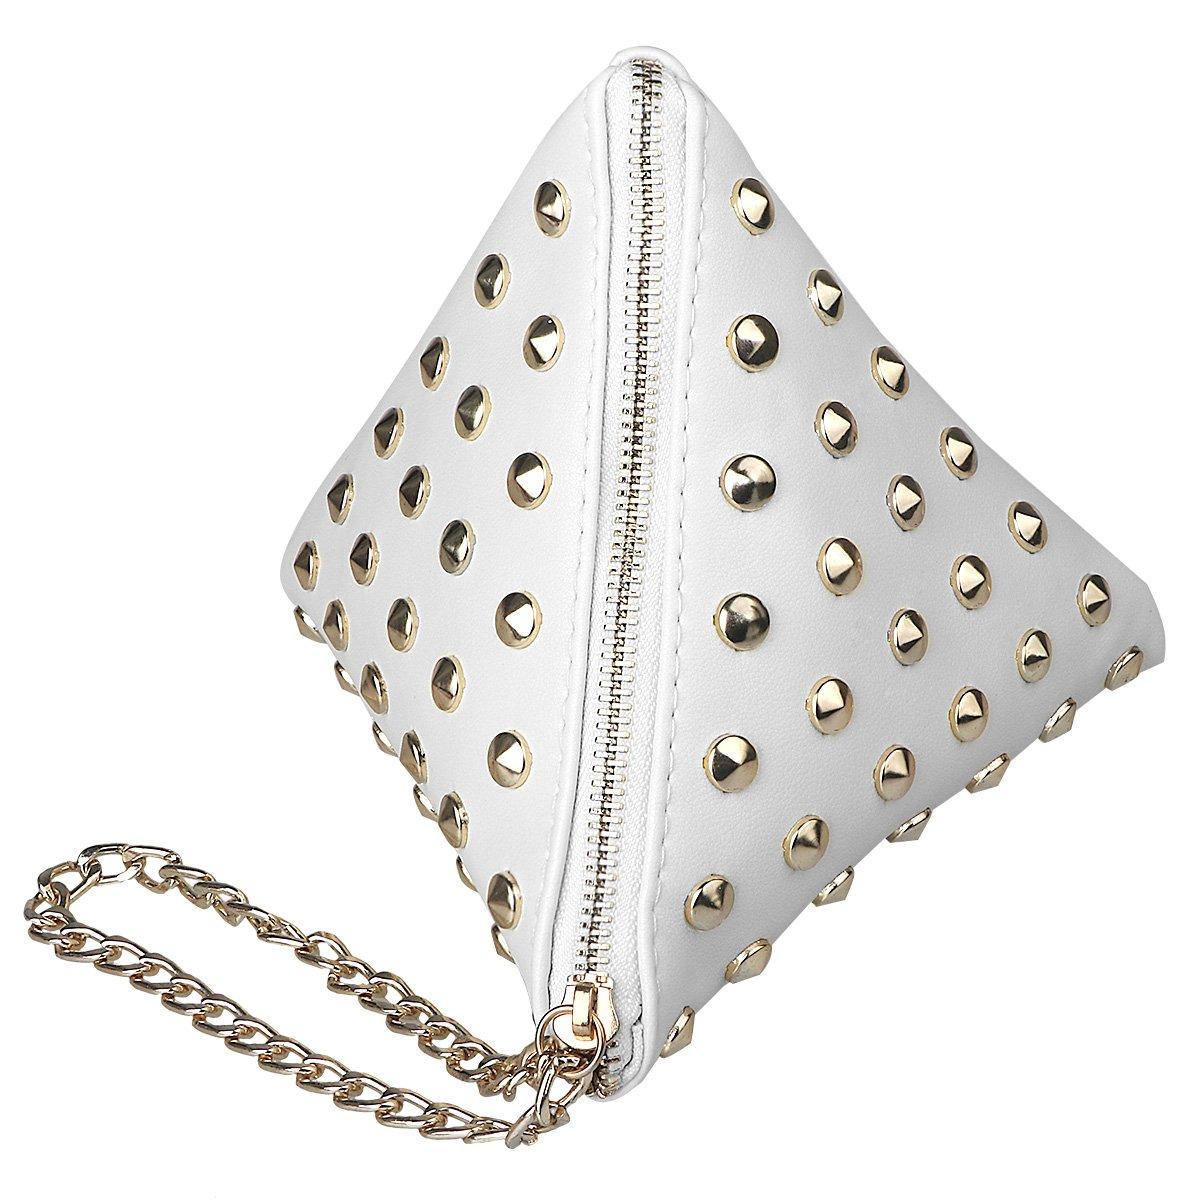 xhorizon TM SR Women PU Leather Rivet Studded Triangle Purse Wristlet Clutch Wallet Handbag